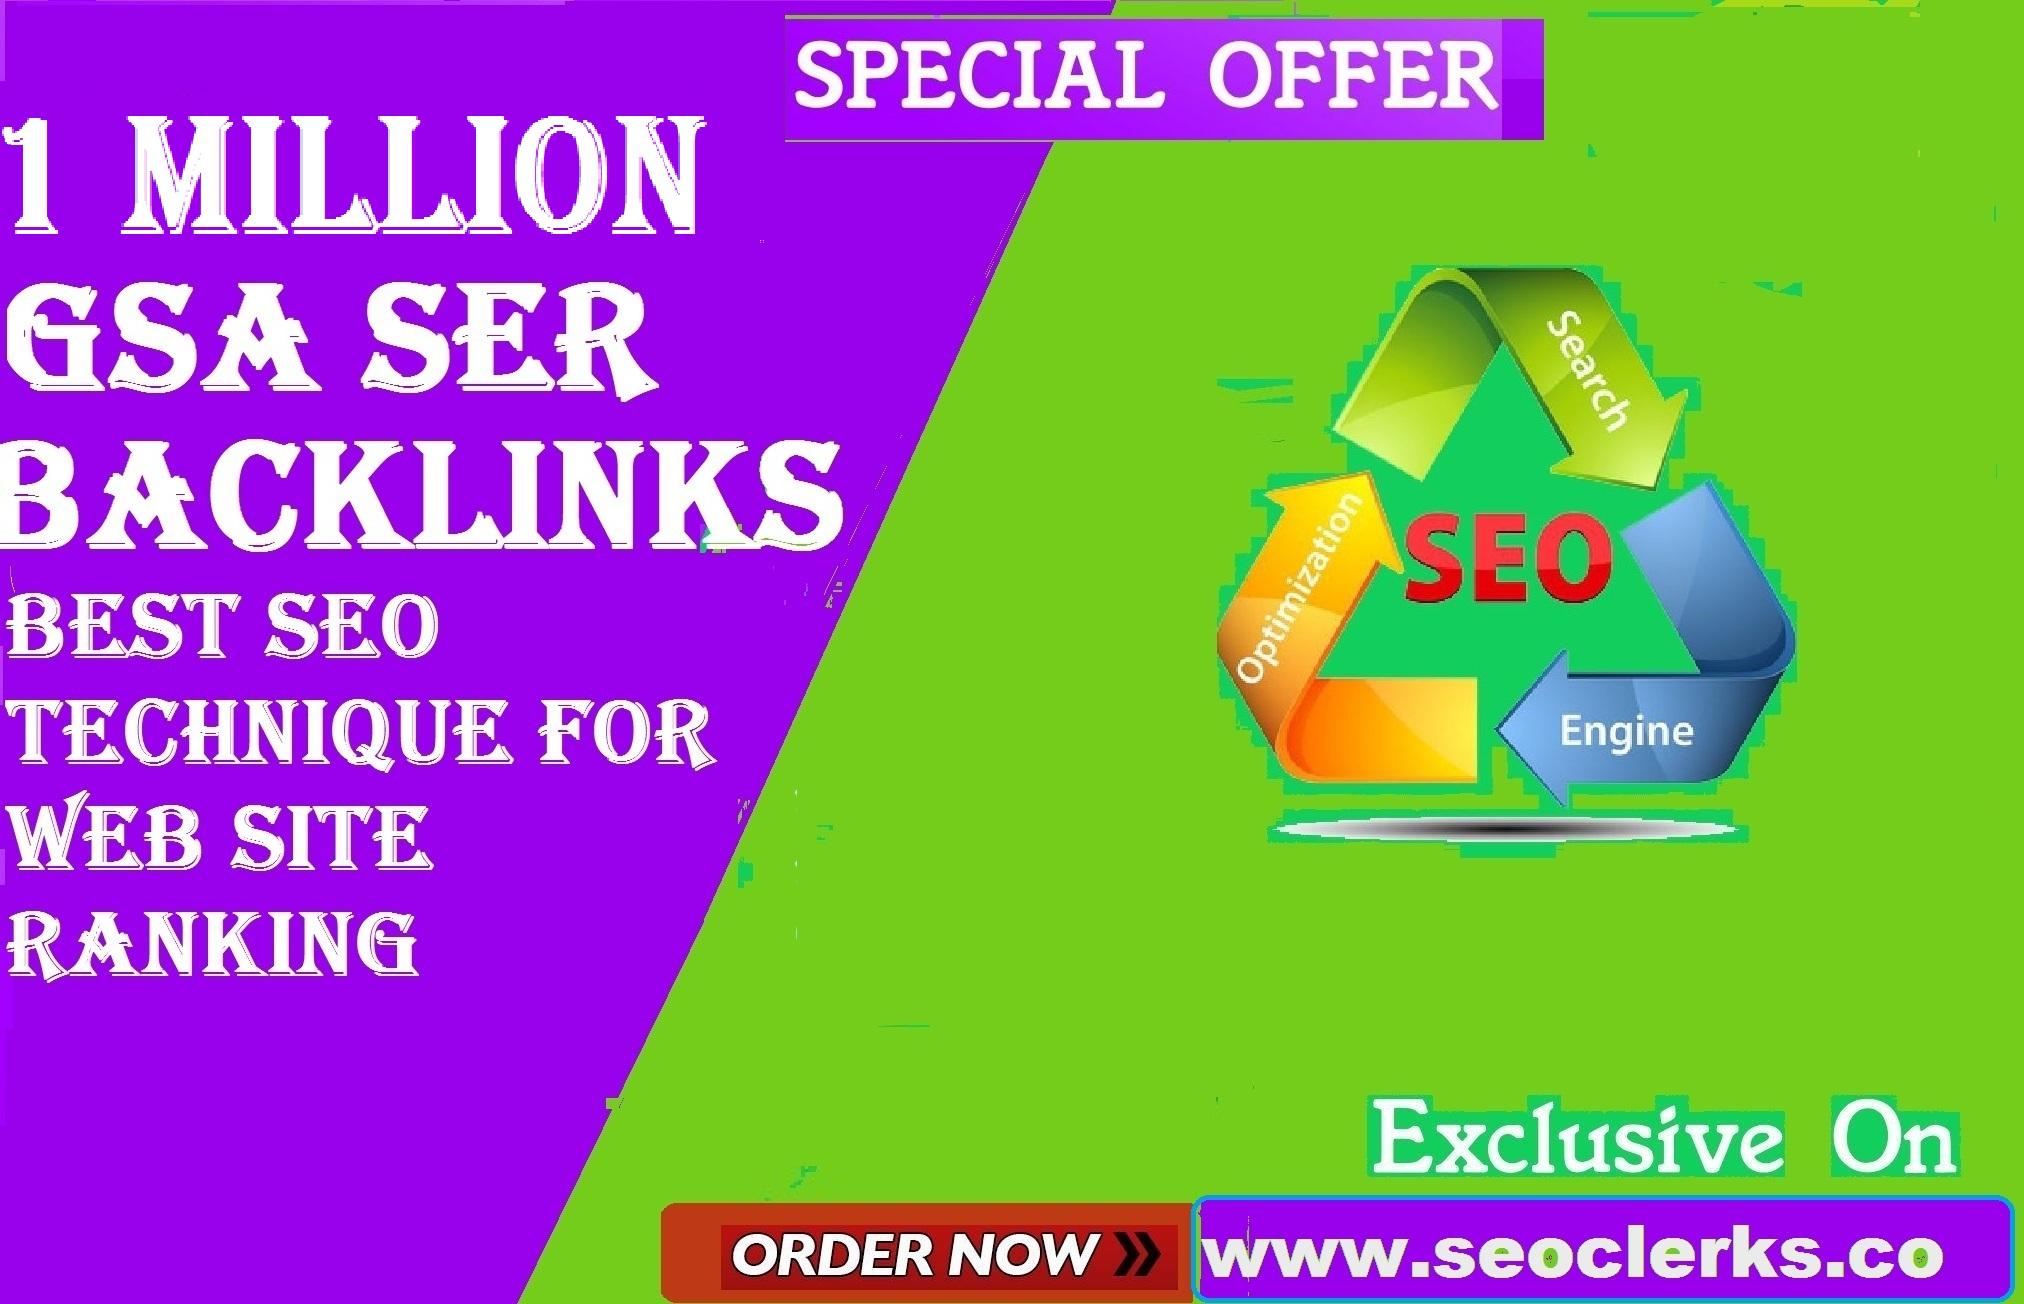 1000,000 GSA SER Verified Backlinks for SEO Ranking